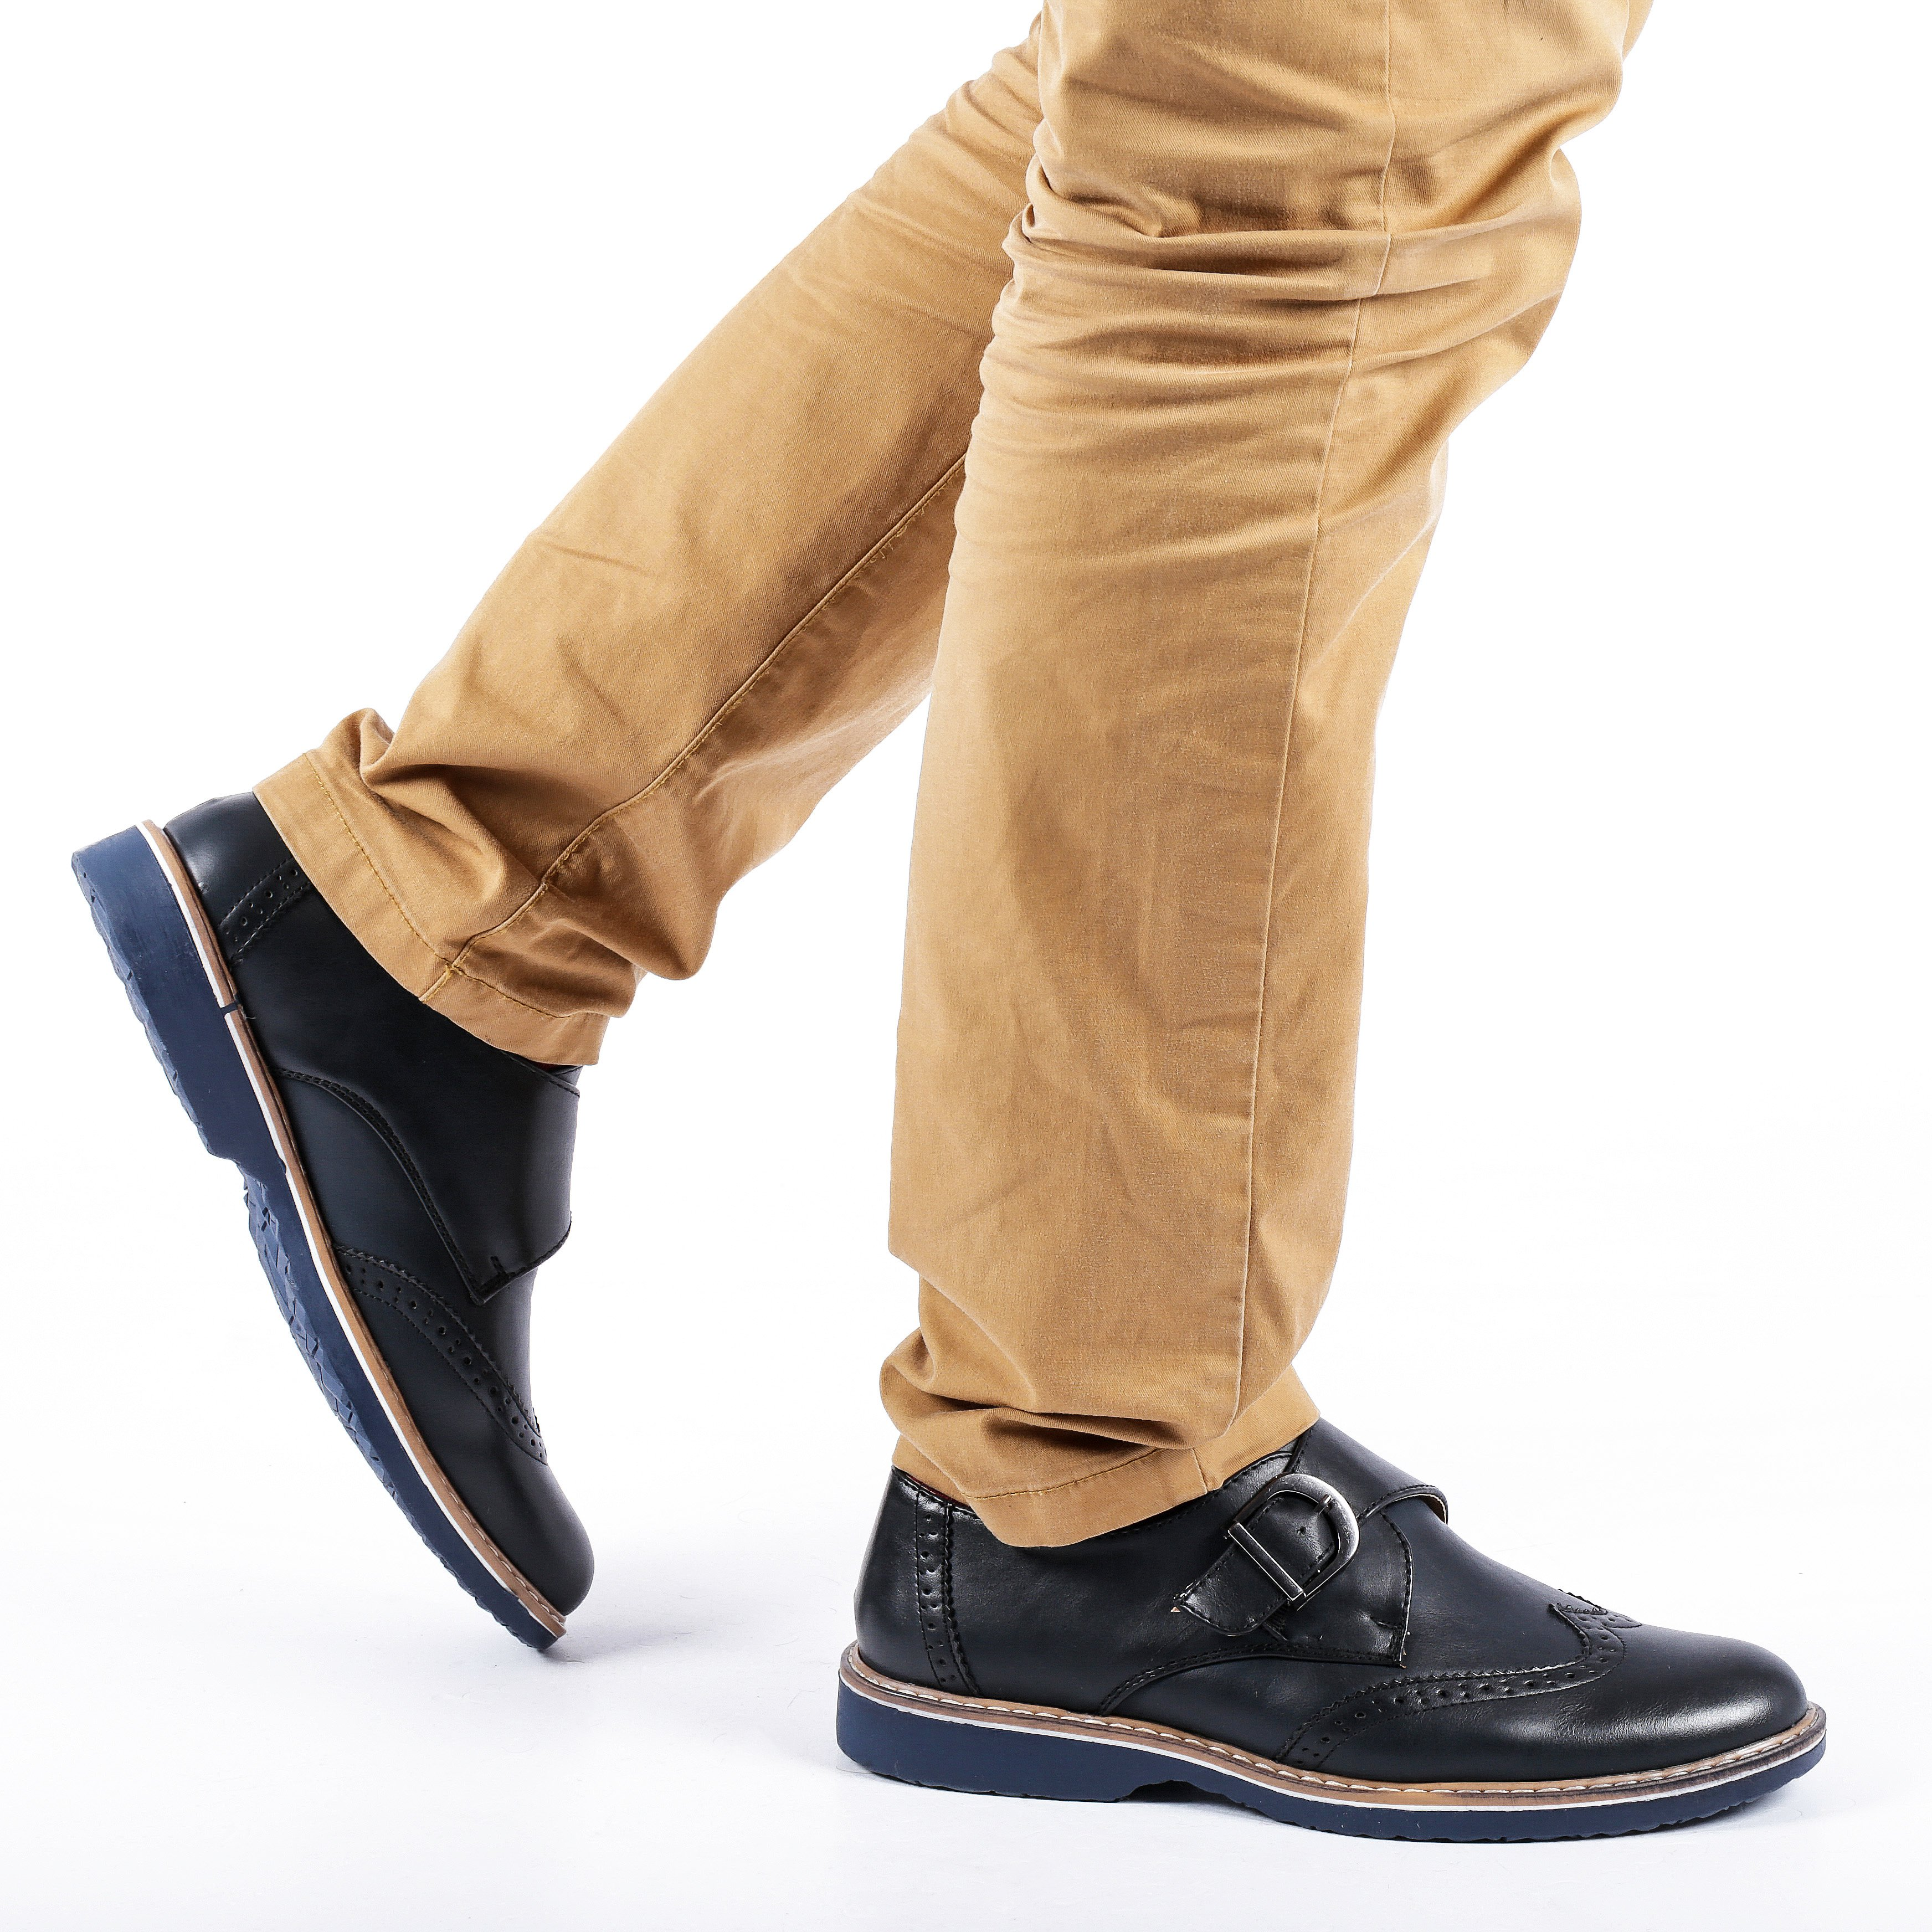 Pantofi barbati Archie negri